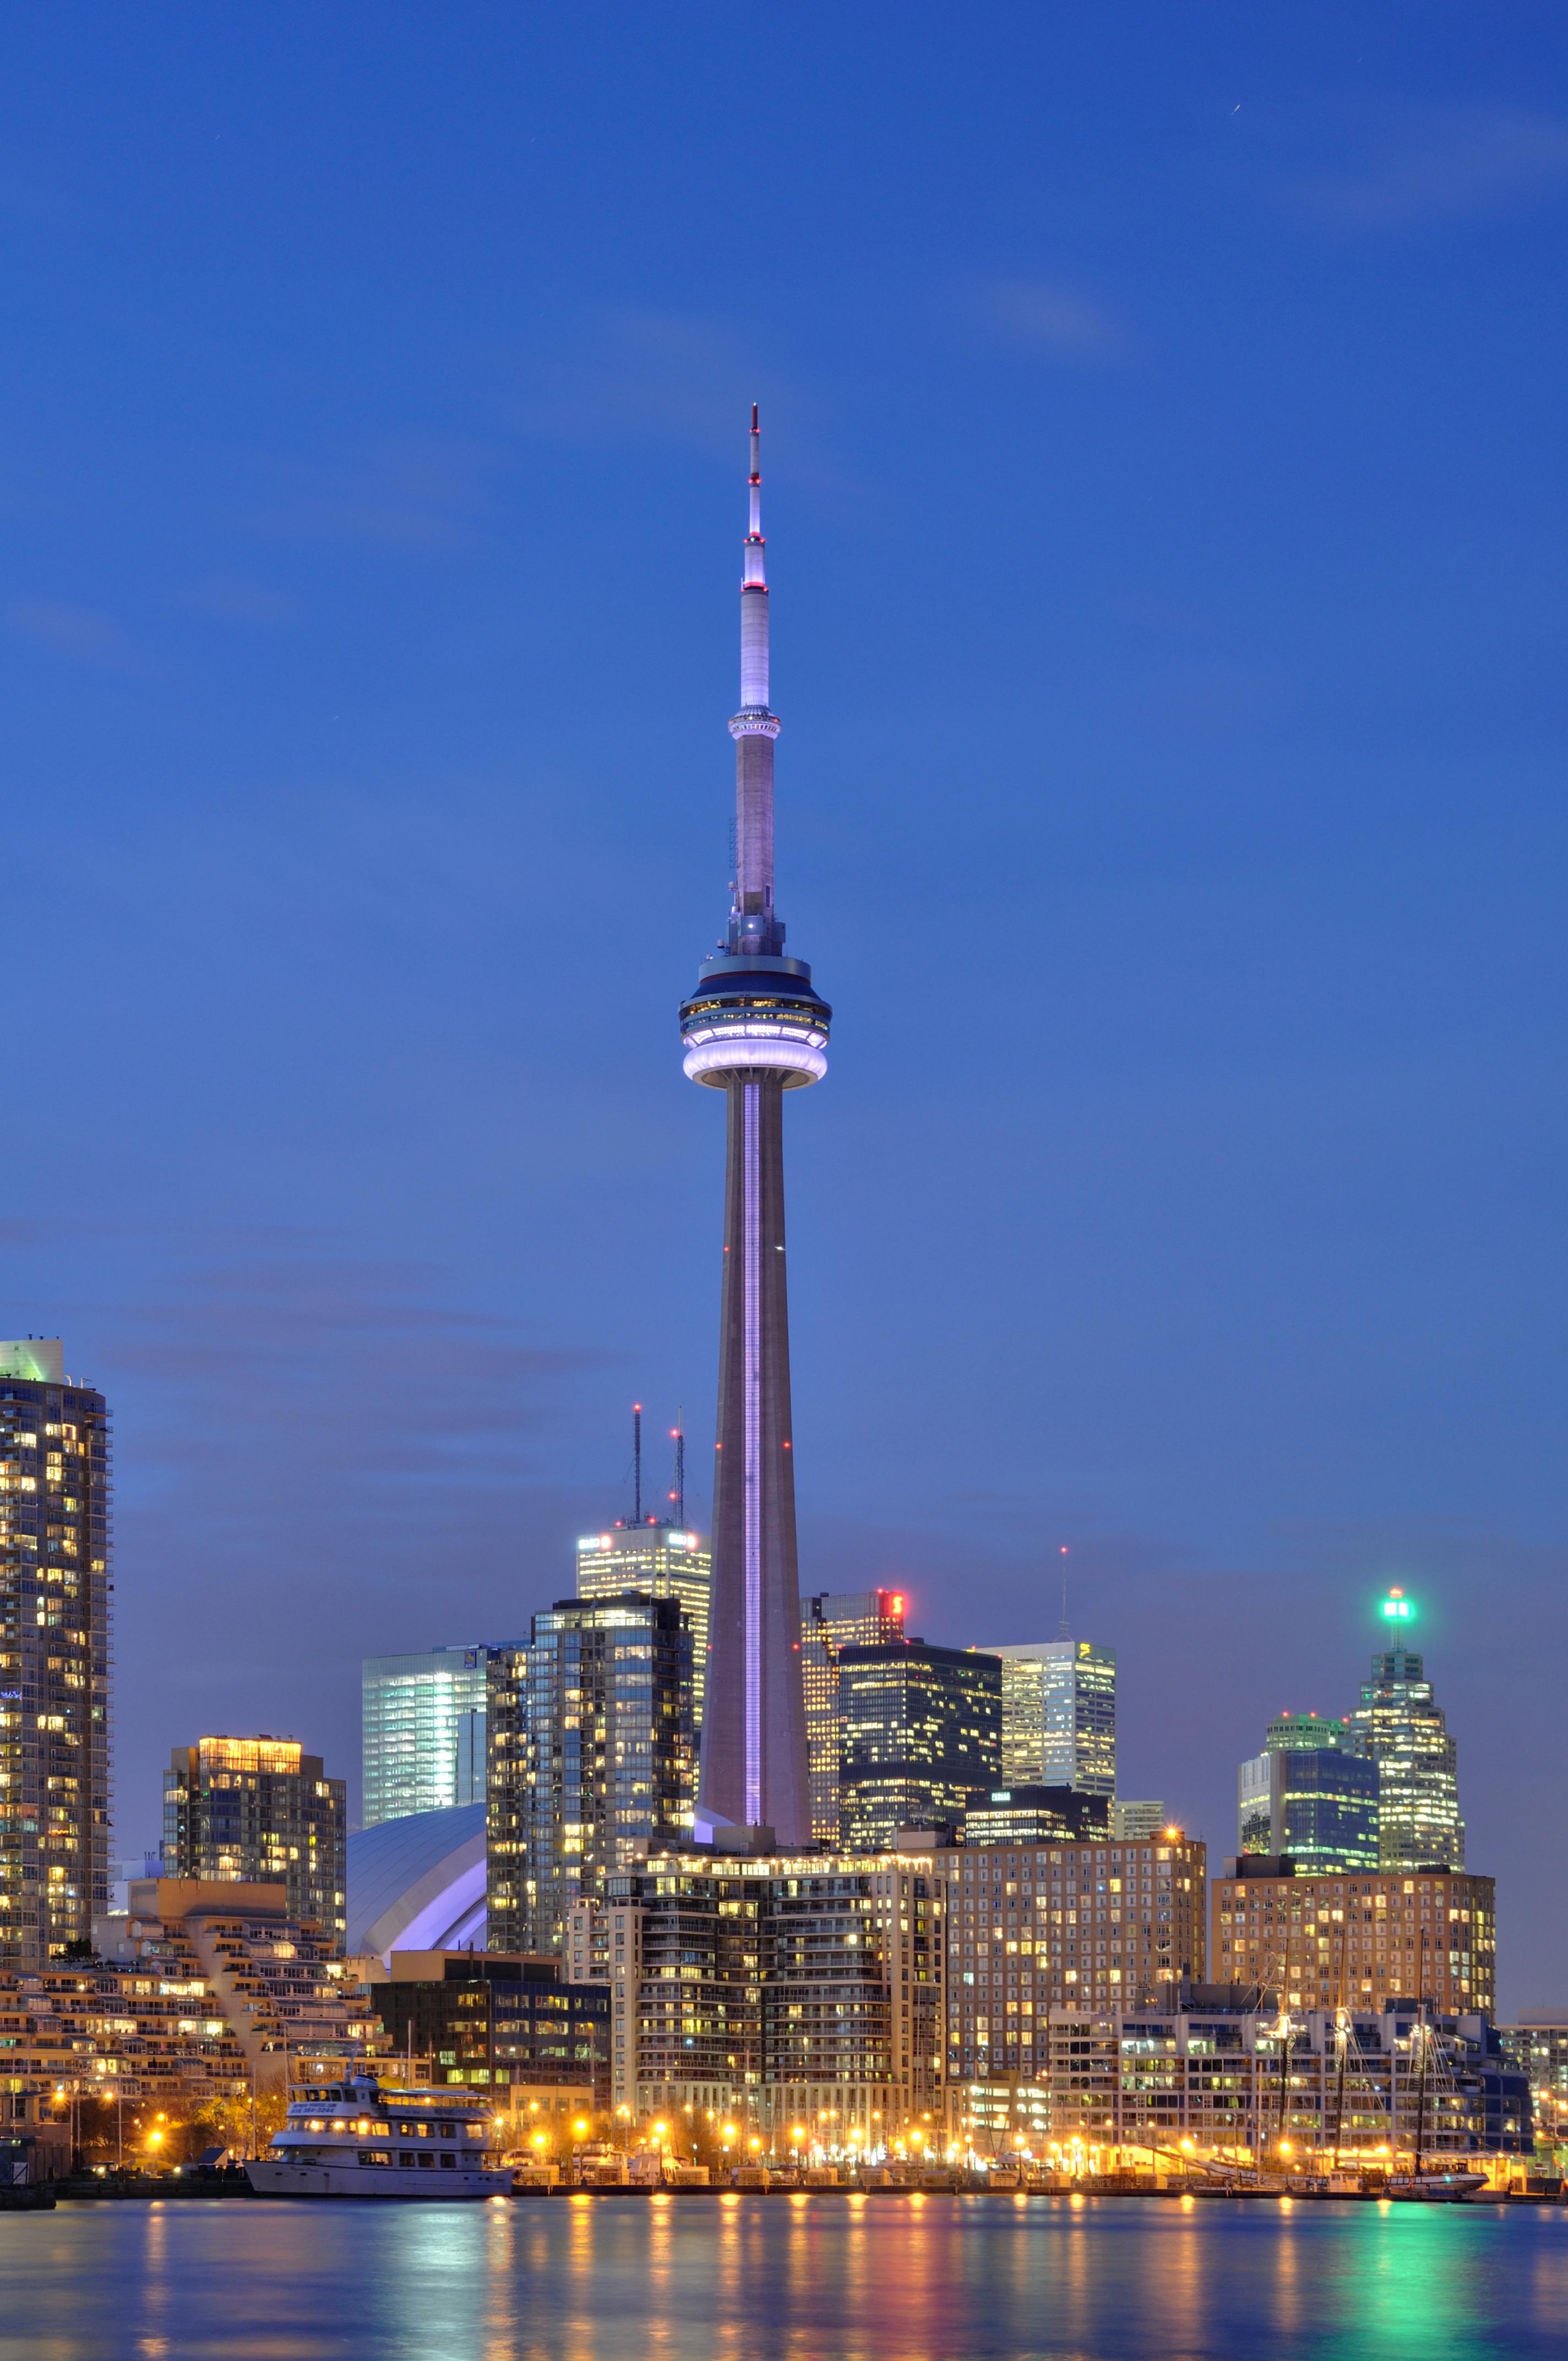 Toronto - ON - CN Tower bei Nacht2.jpg